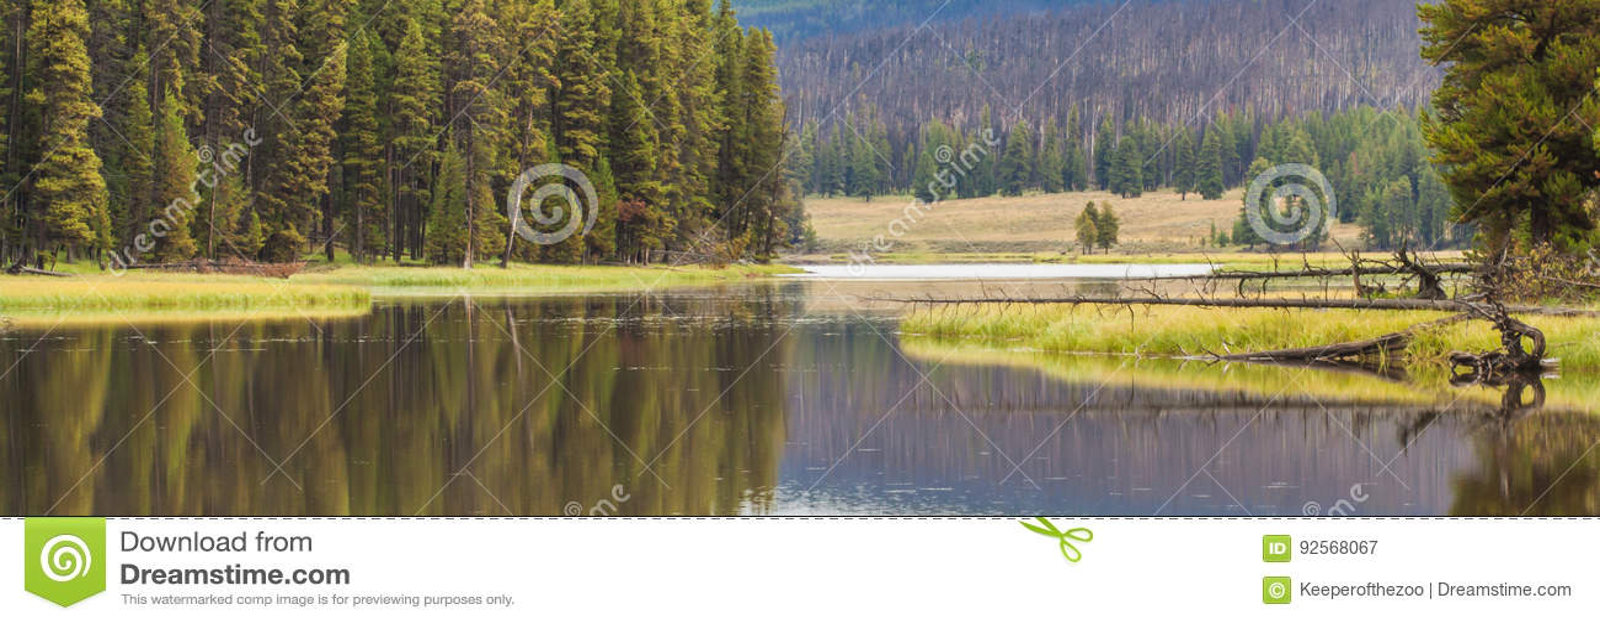 Serene Yellowstone River Landscape